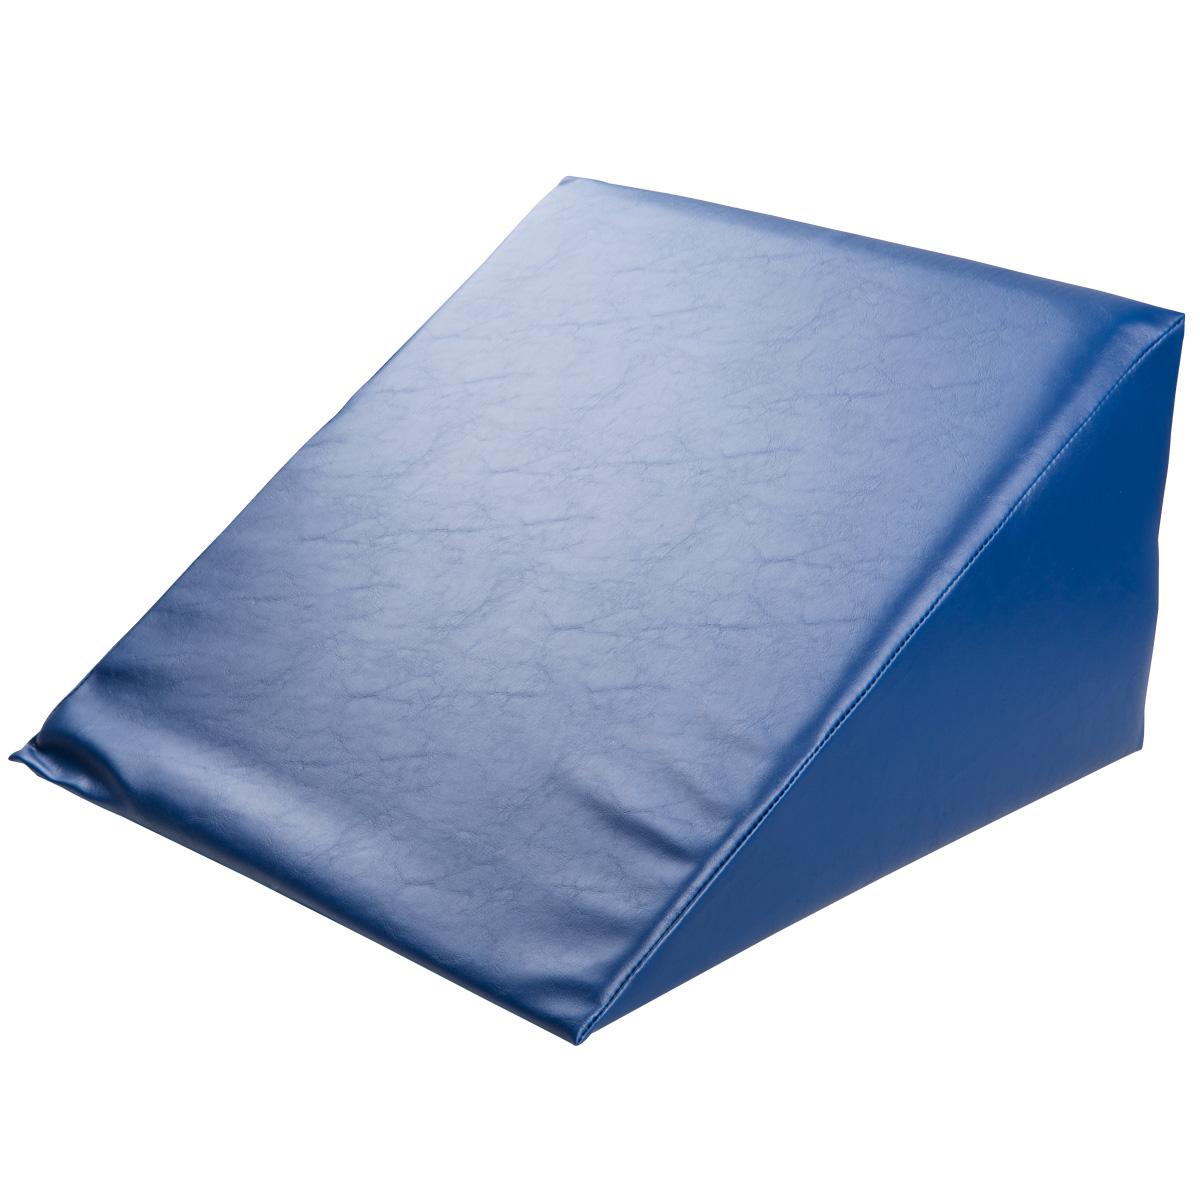 Large Foam Wedge Pillow - 1004999 - 3B Scientific ...